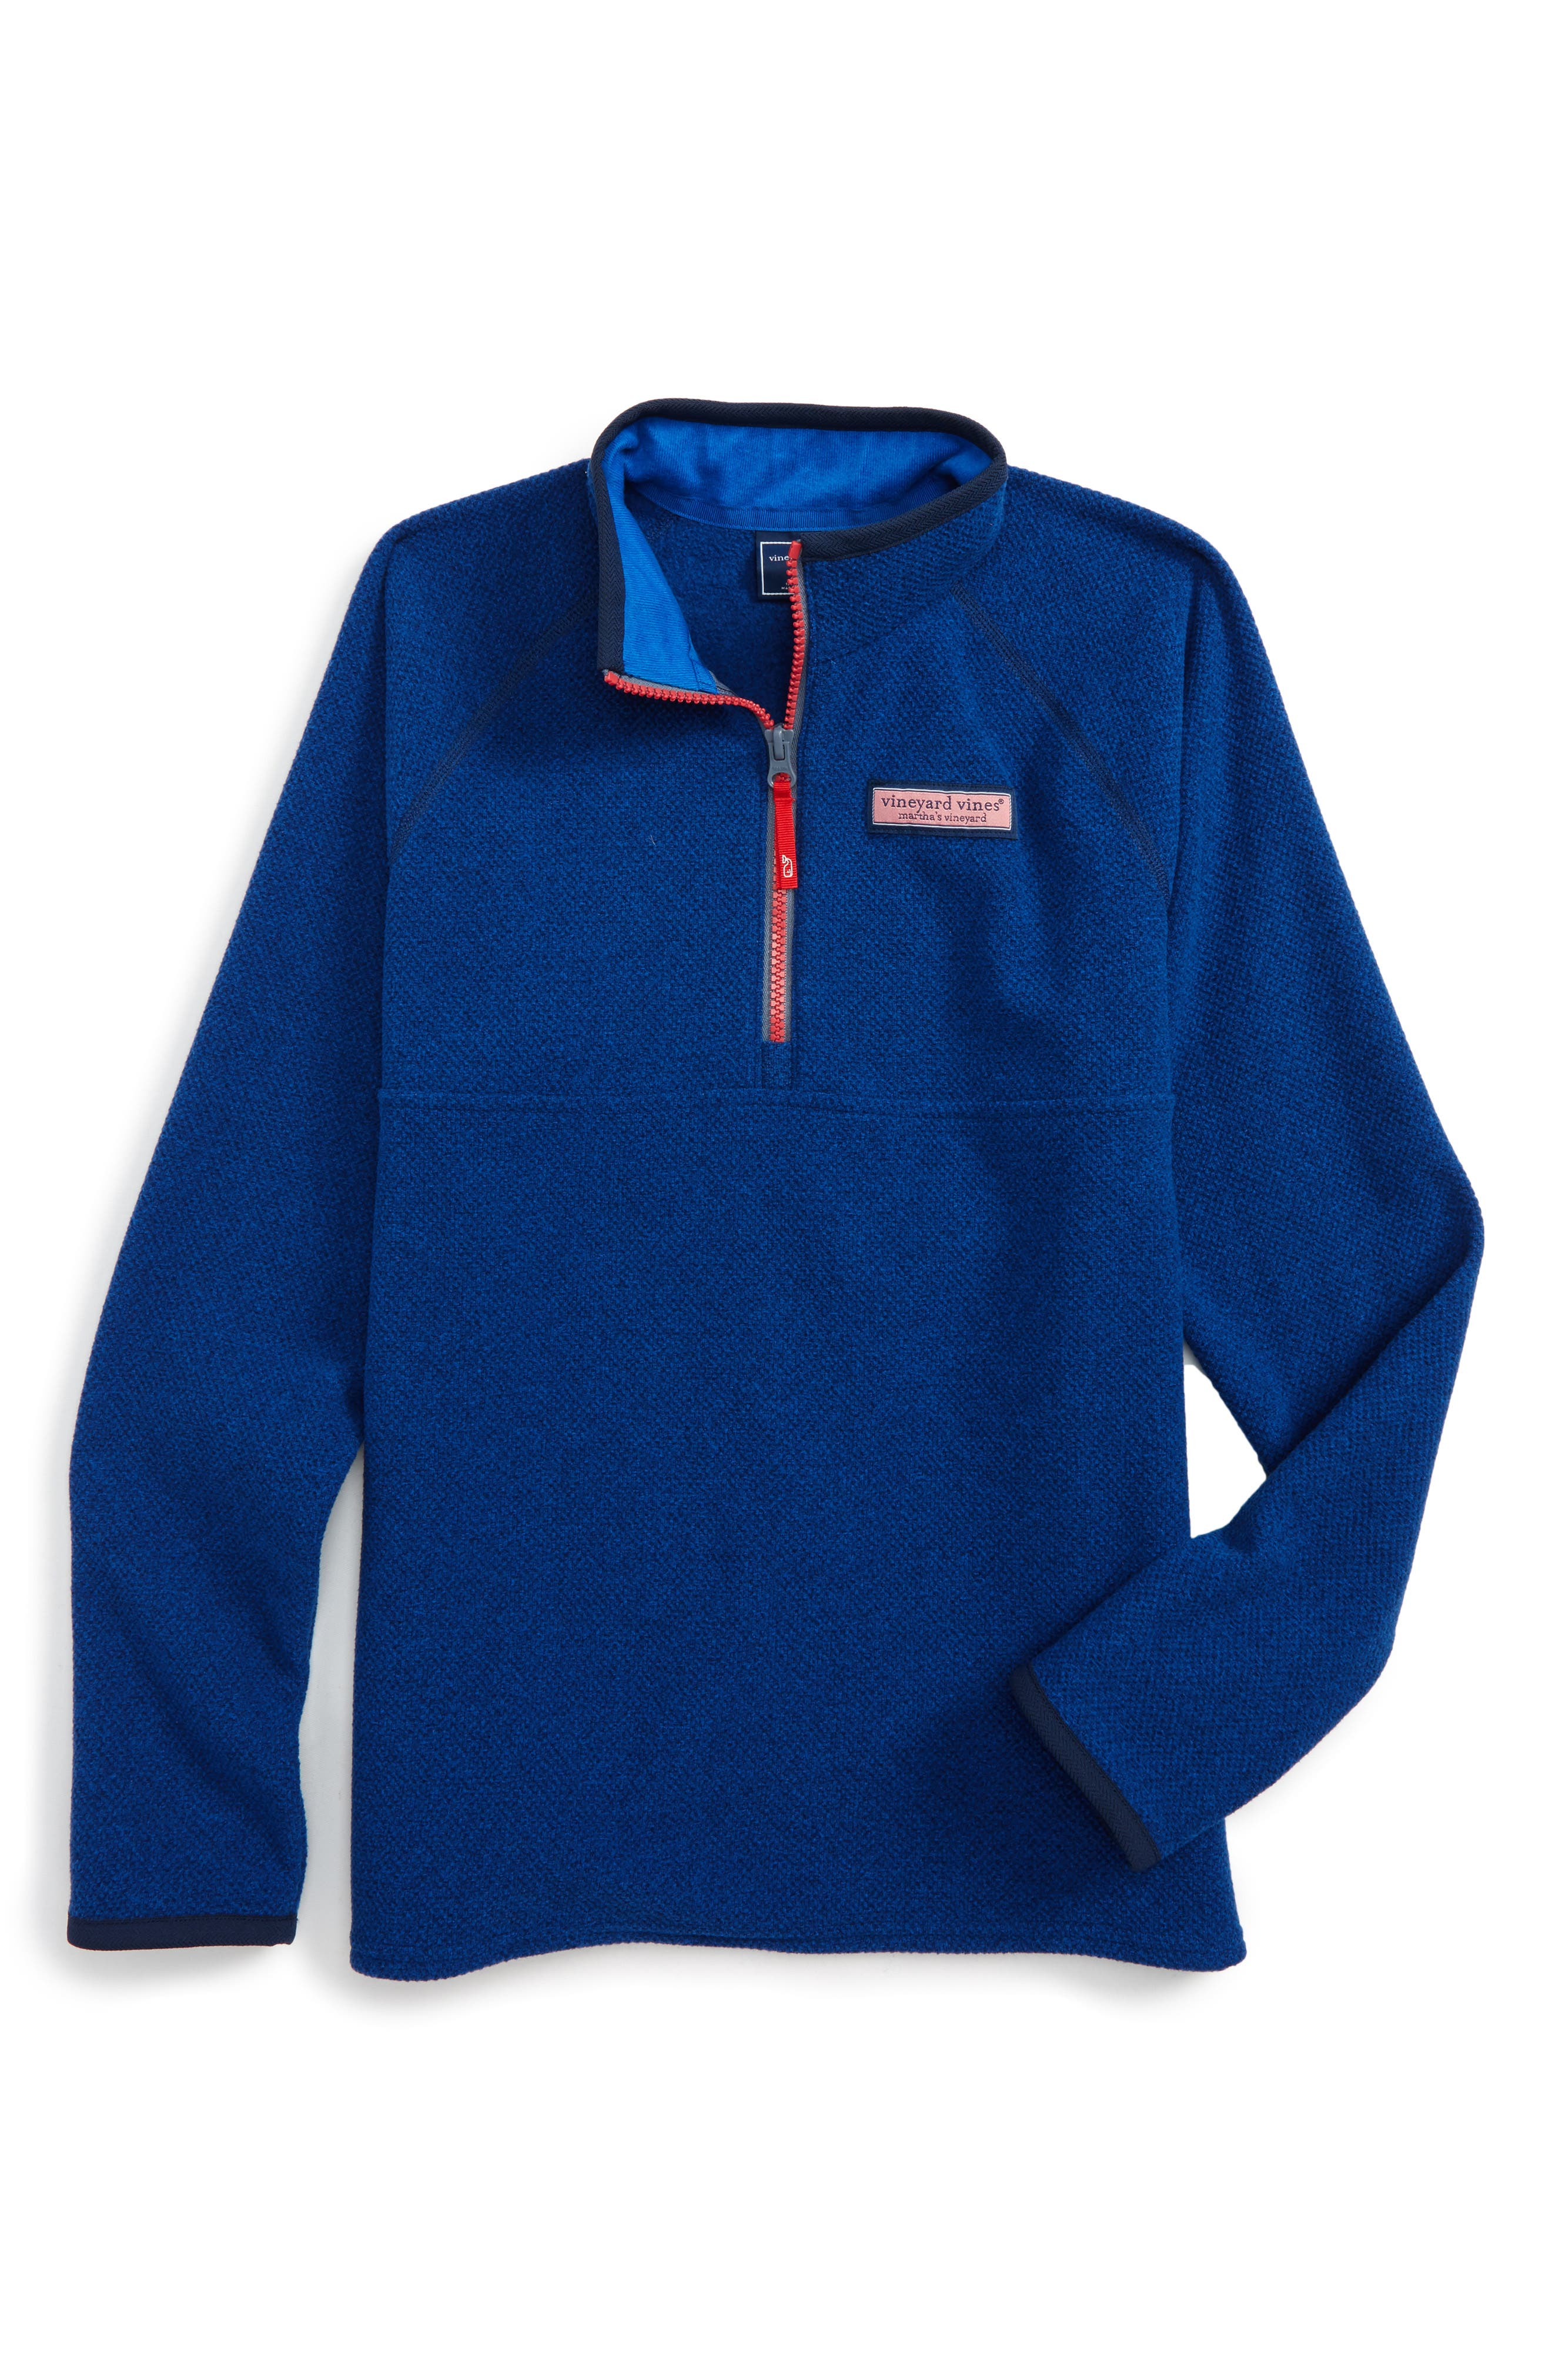 Quarter Zip Sweater,                         Main,                         color, 406